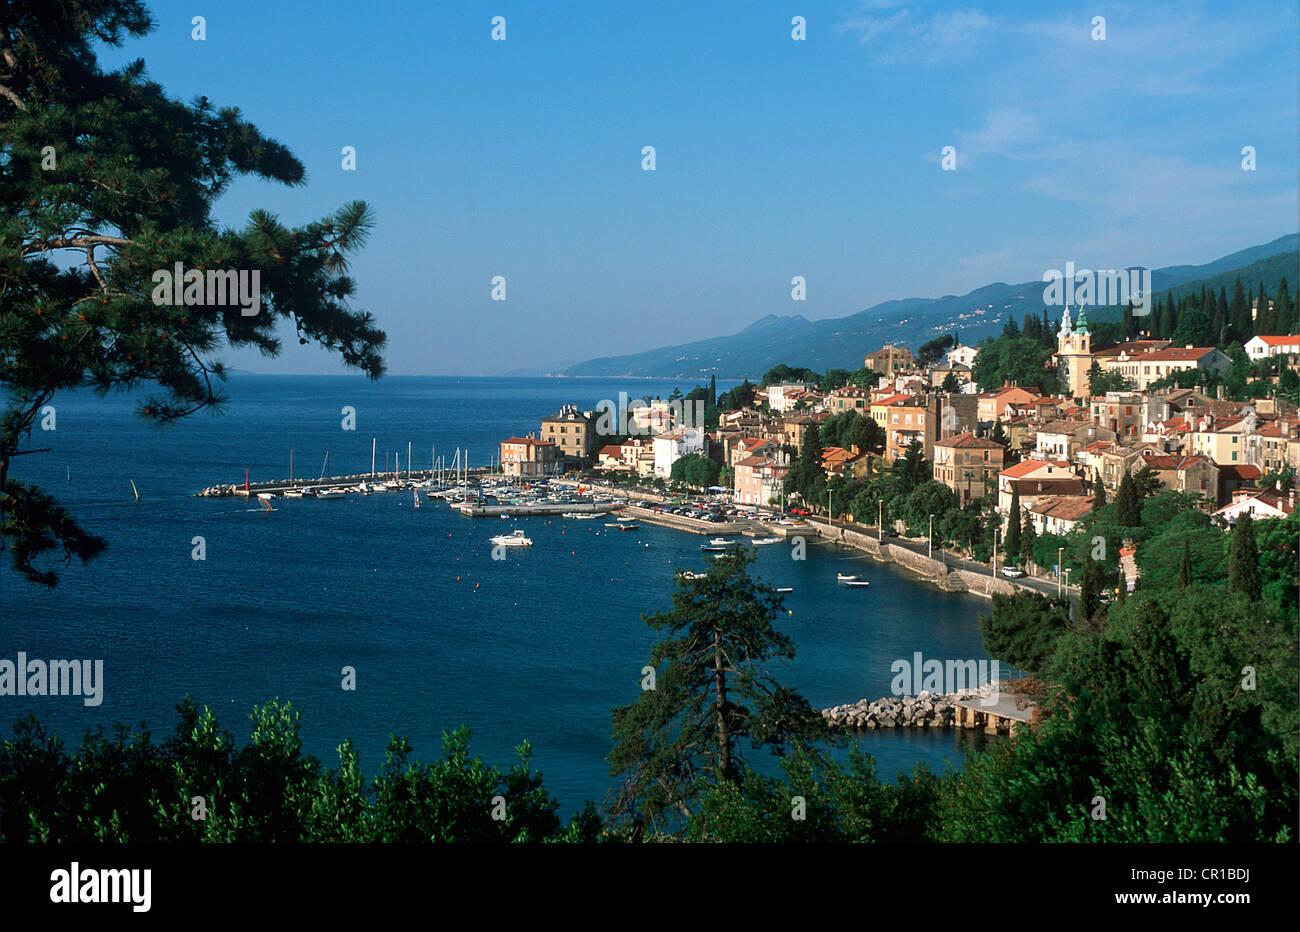 Casino adriatic opatija croatia